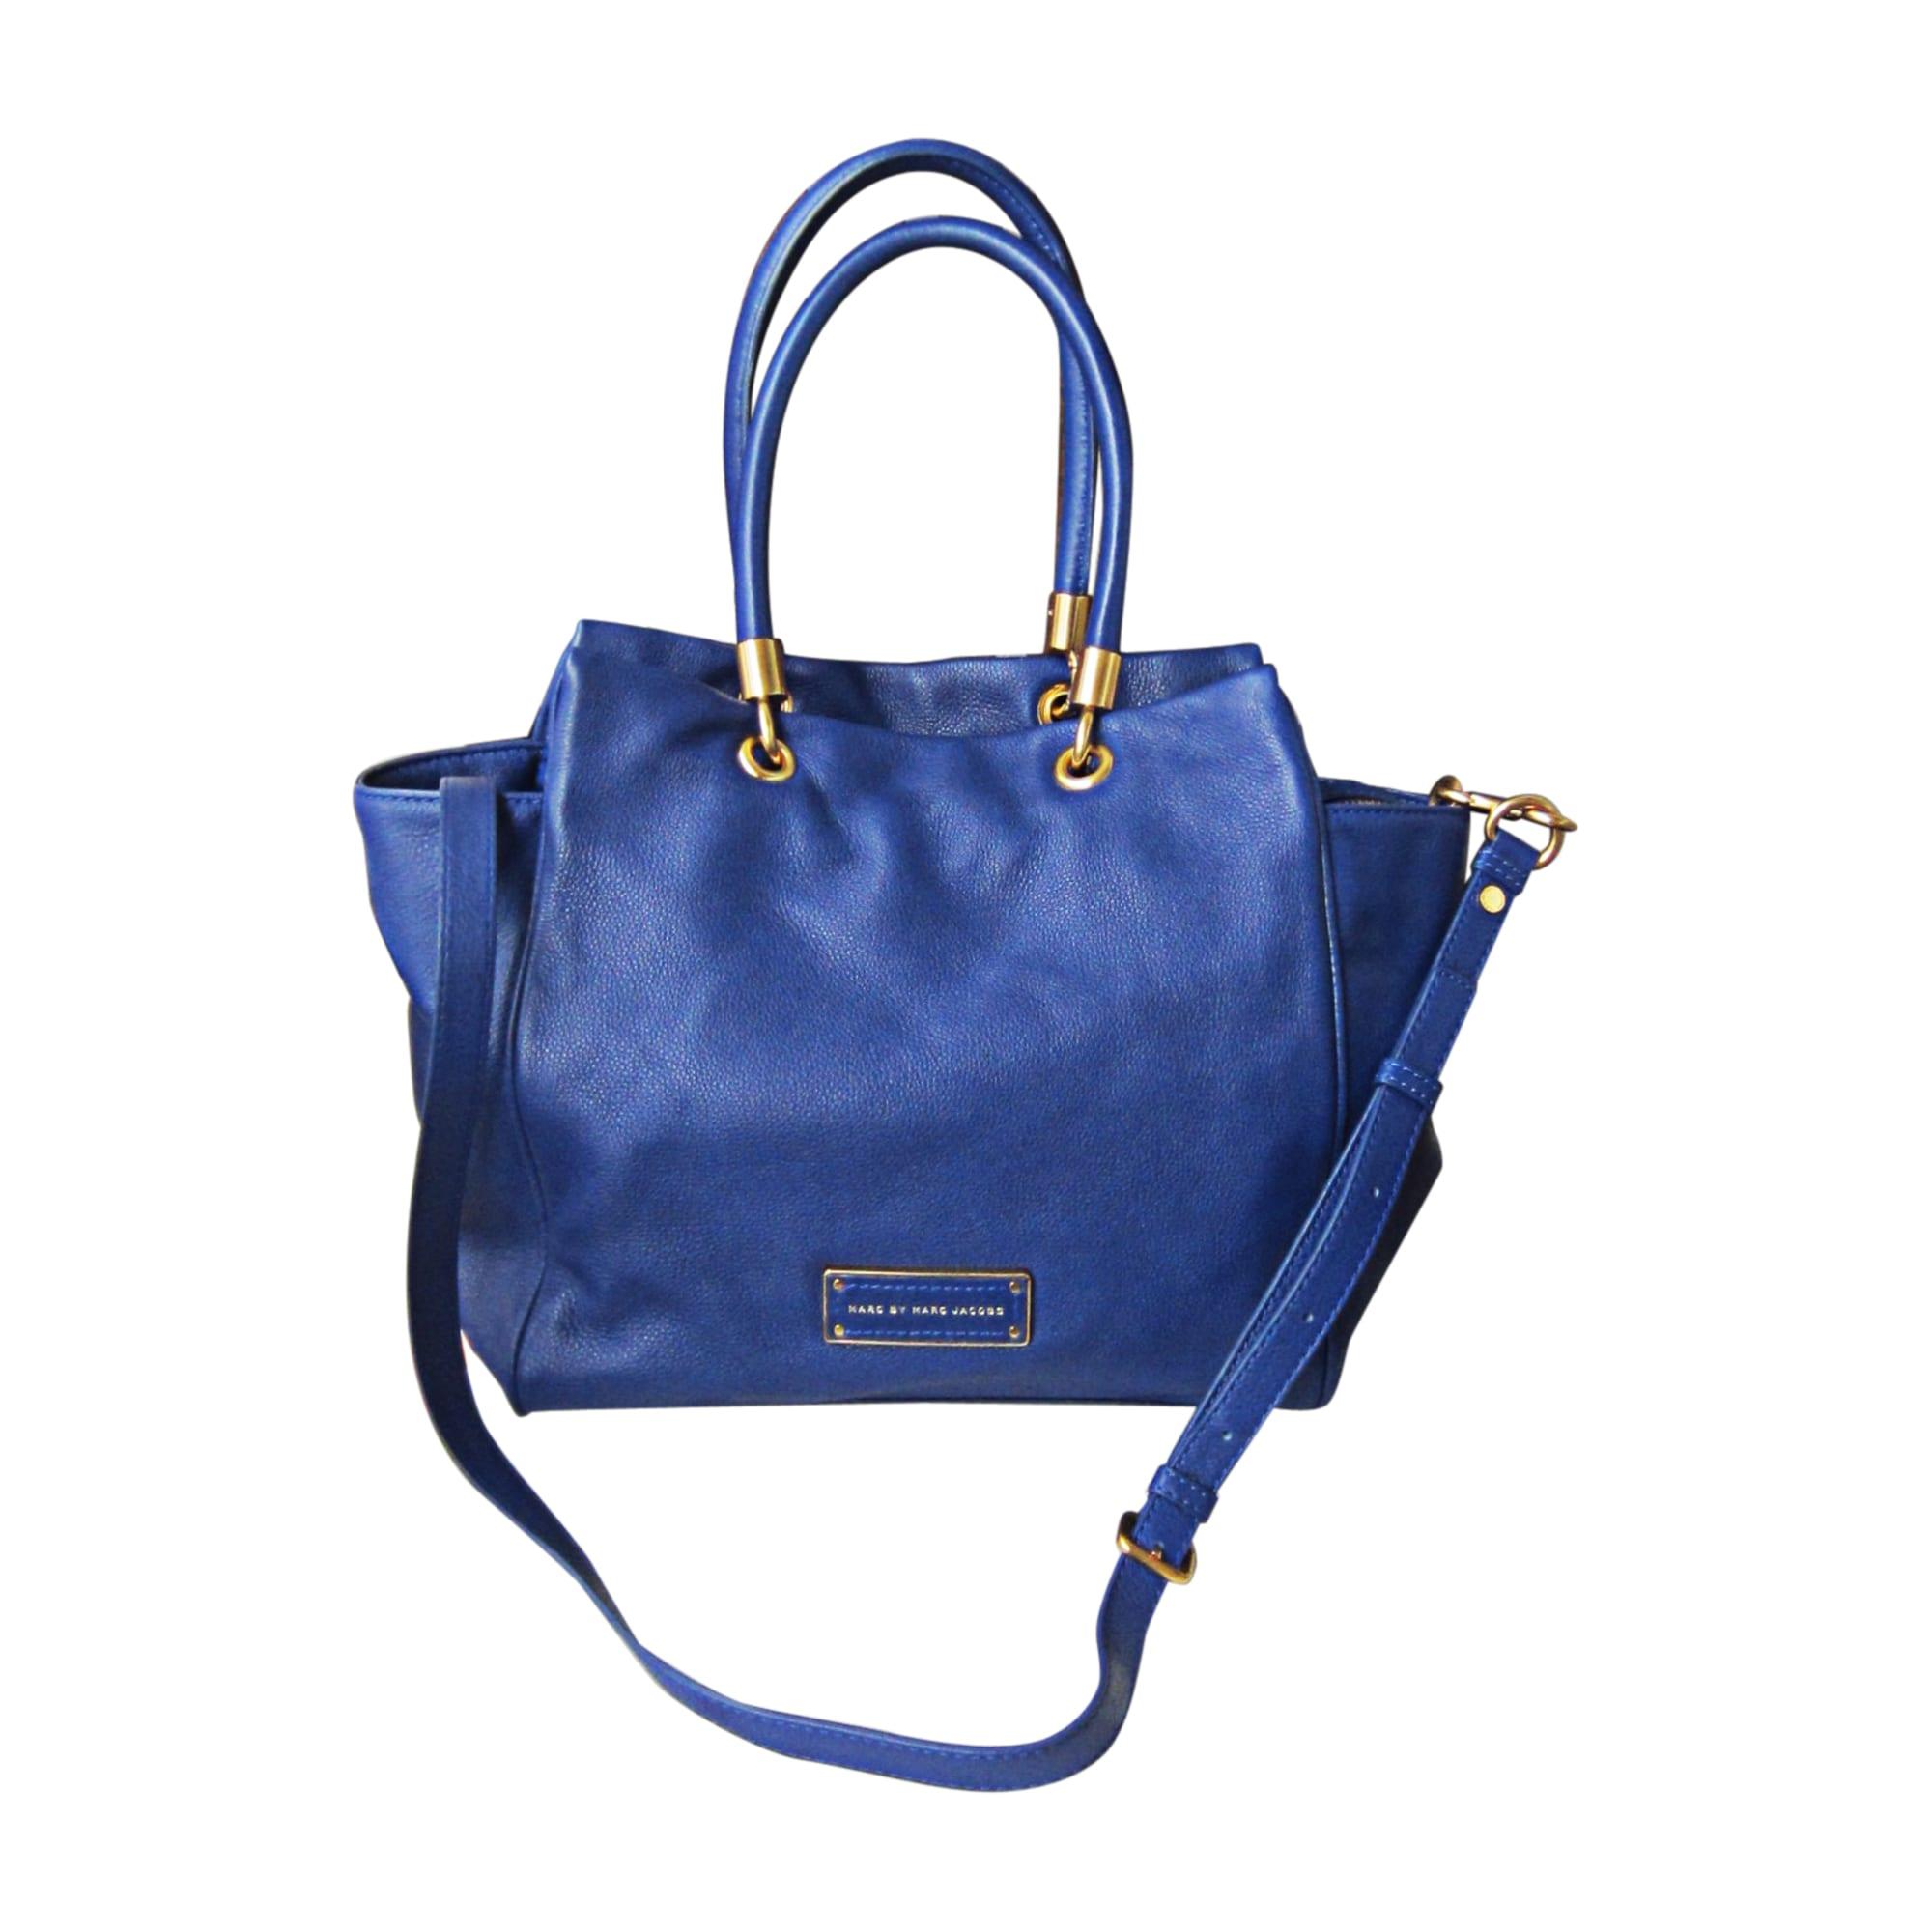 a8f69131b7 Sac à main en cuir MARC JACOBS Bleu, bleu marine, bleu turquoise